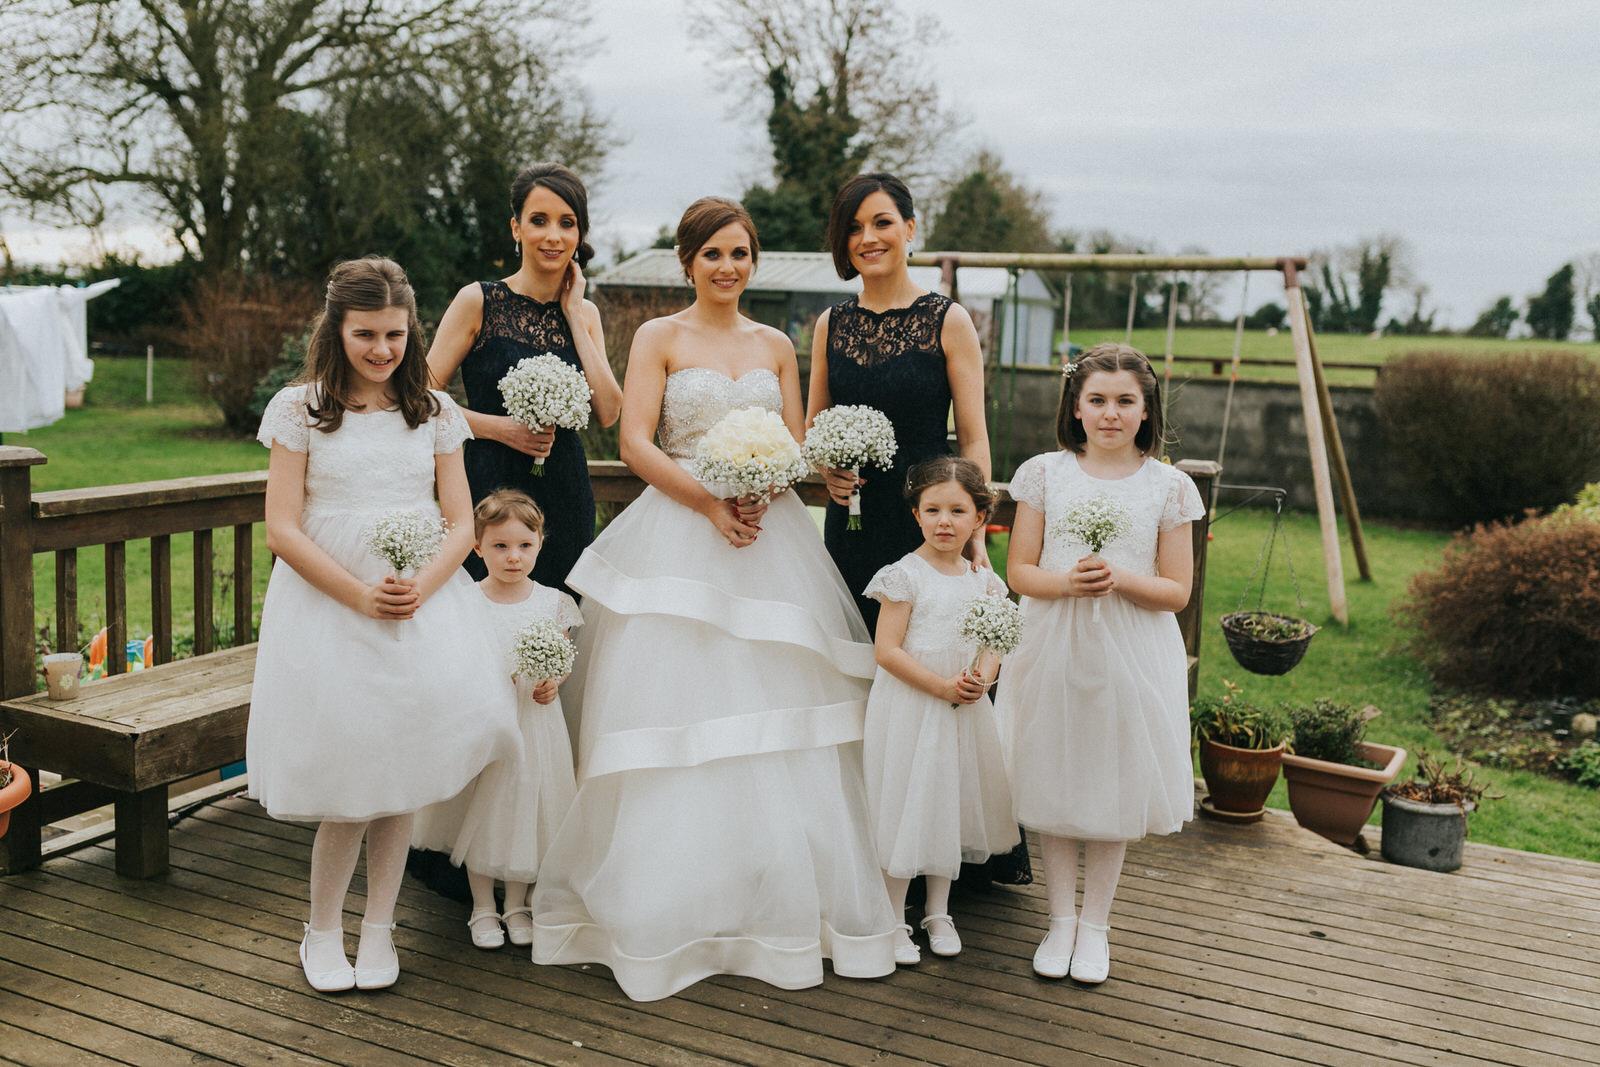 Clonabreany_wedding-photographer_roger_kenny_ireland_035.jpg